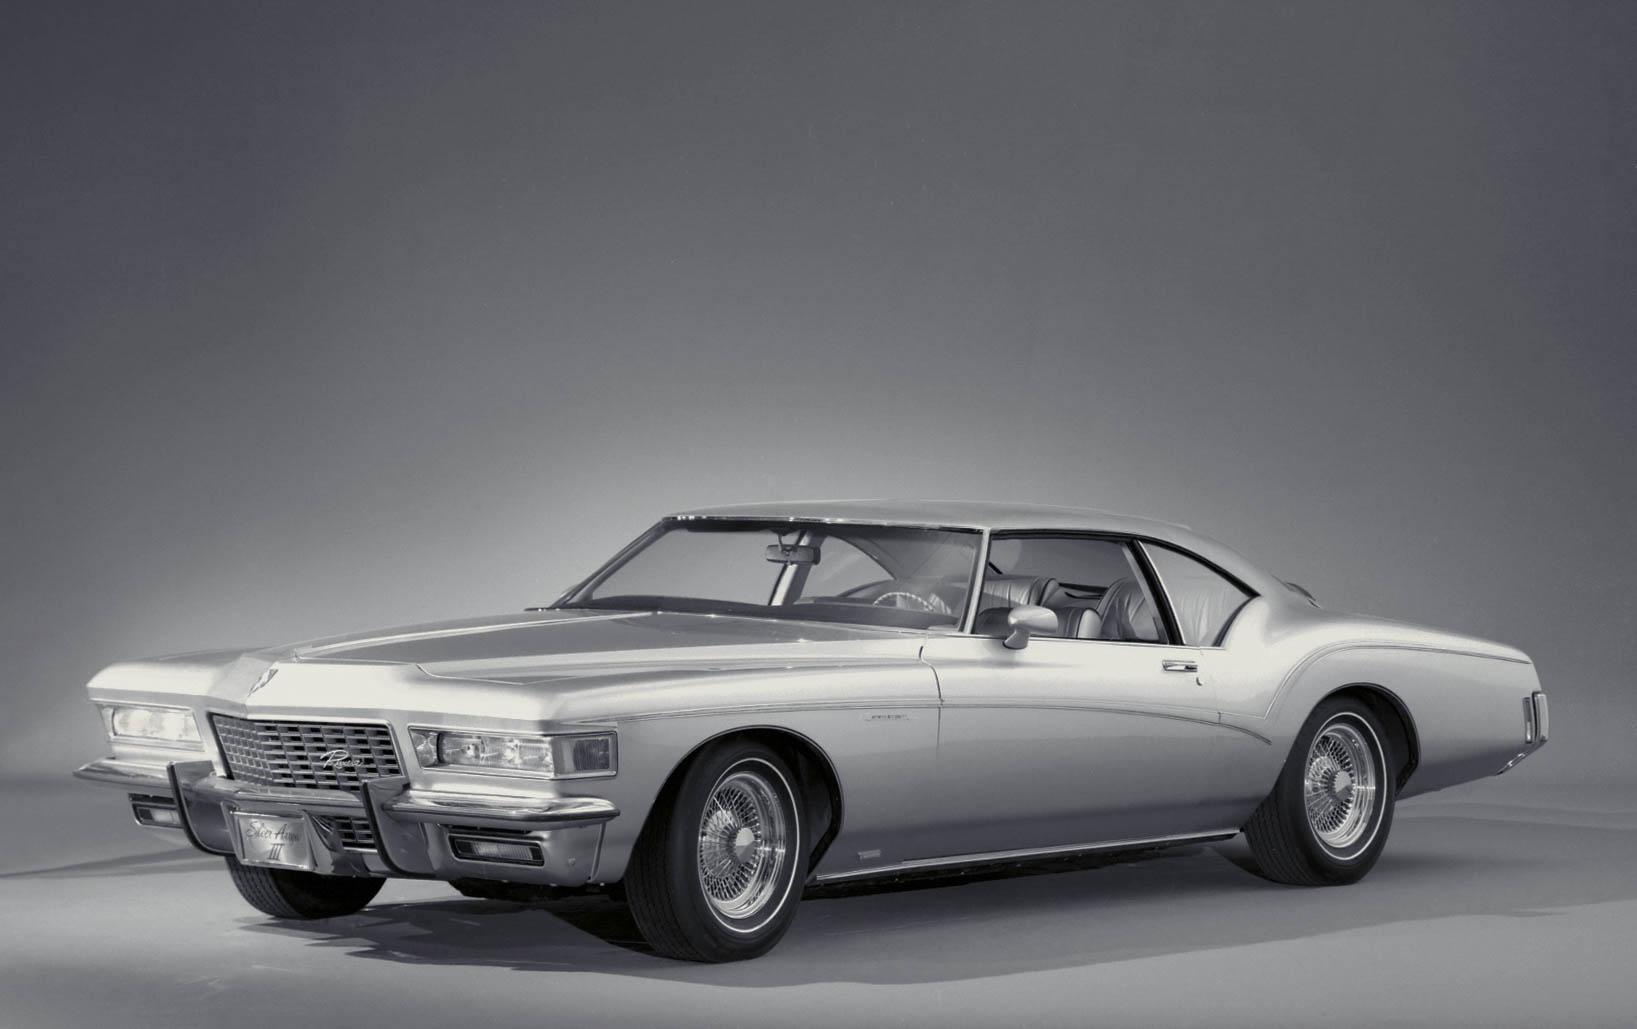 1972 Buick Riviera press photo